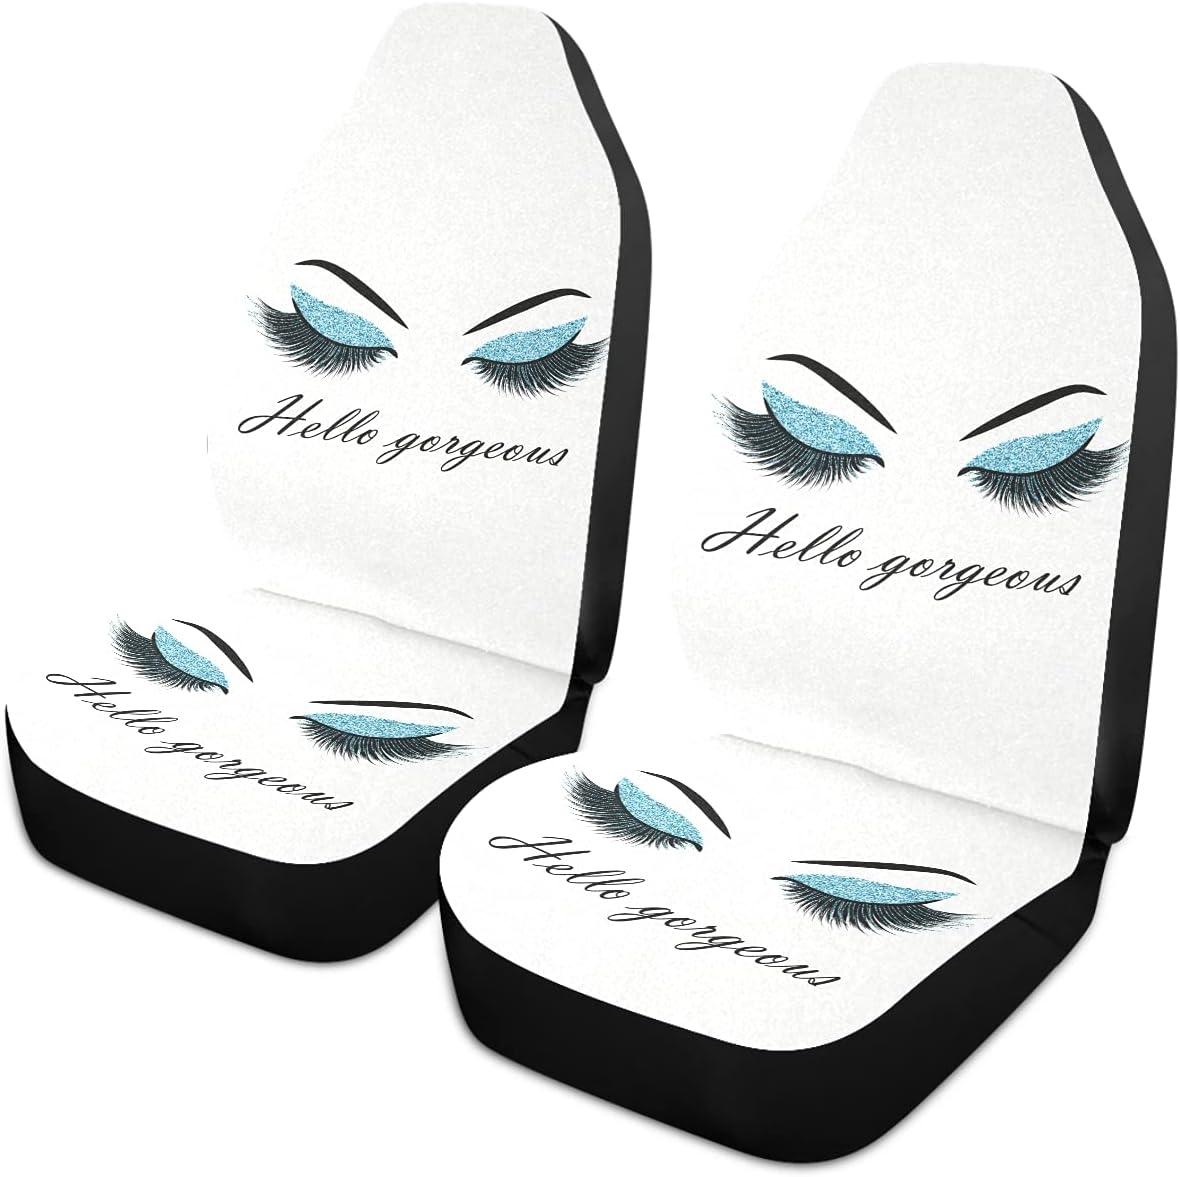 Oarencol Women Eyes Hello Gorgeous Fees free!! Eyelash Blue Car Las Vegas Mall Seat Covers